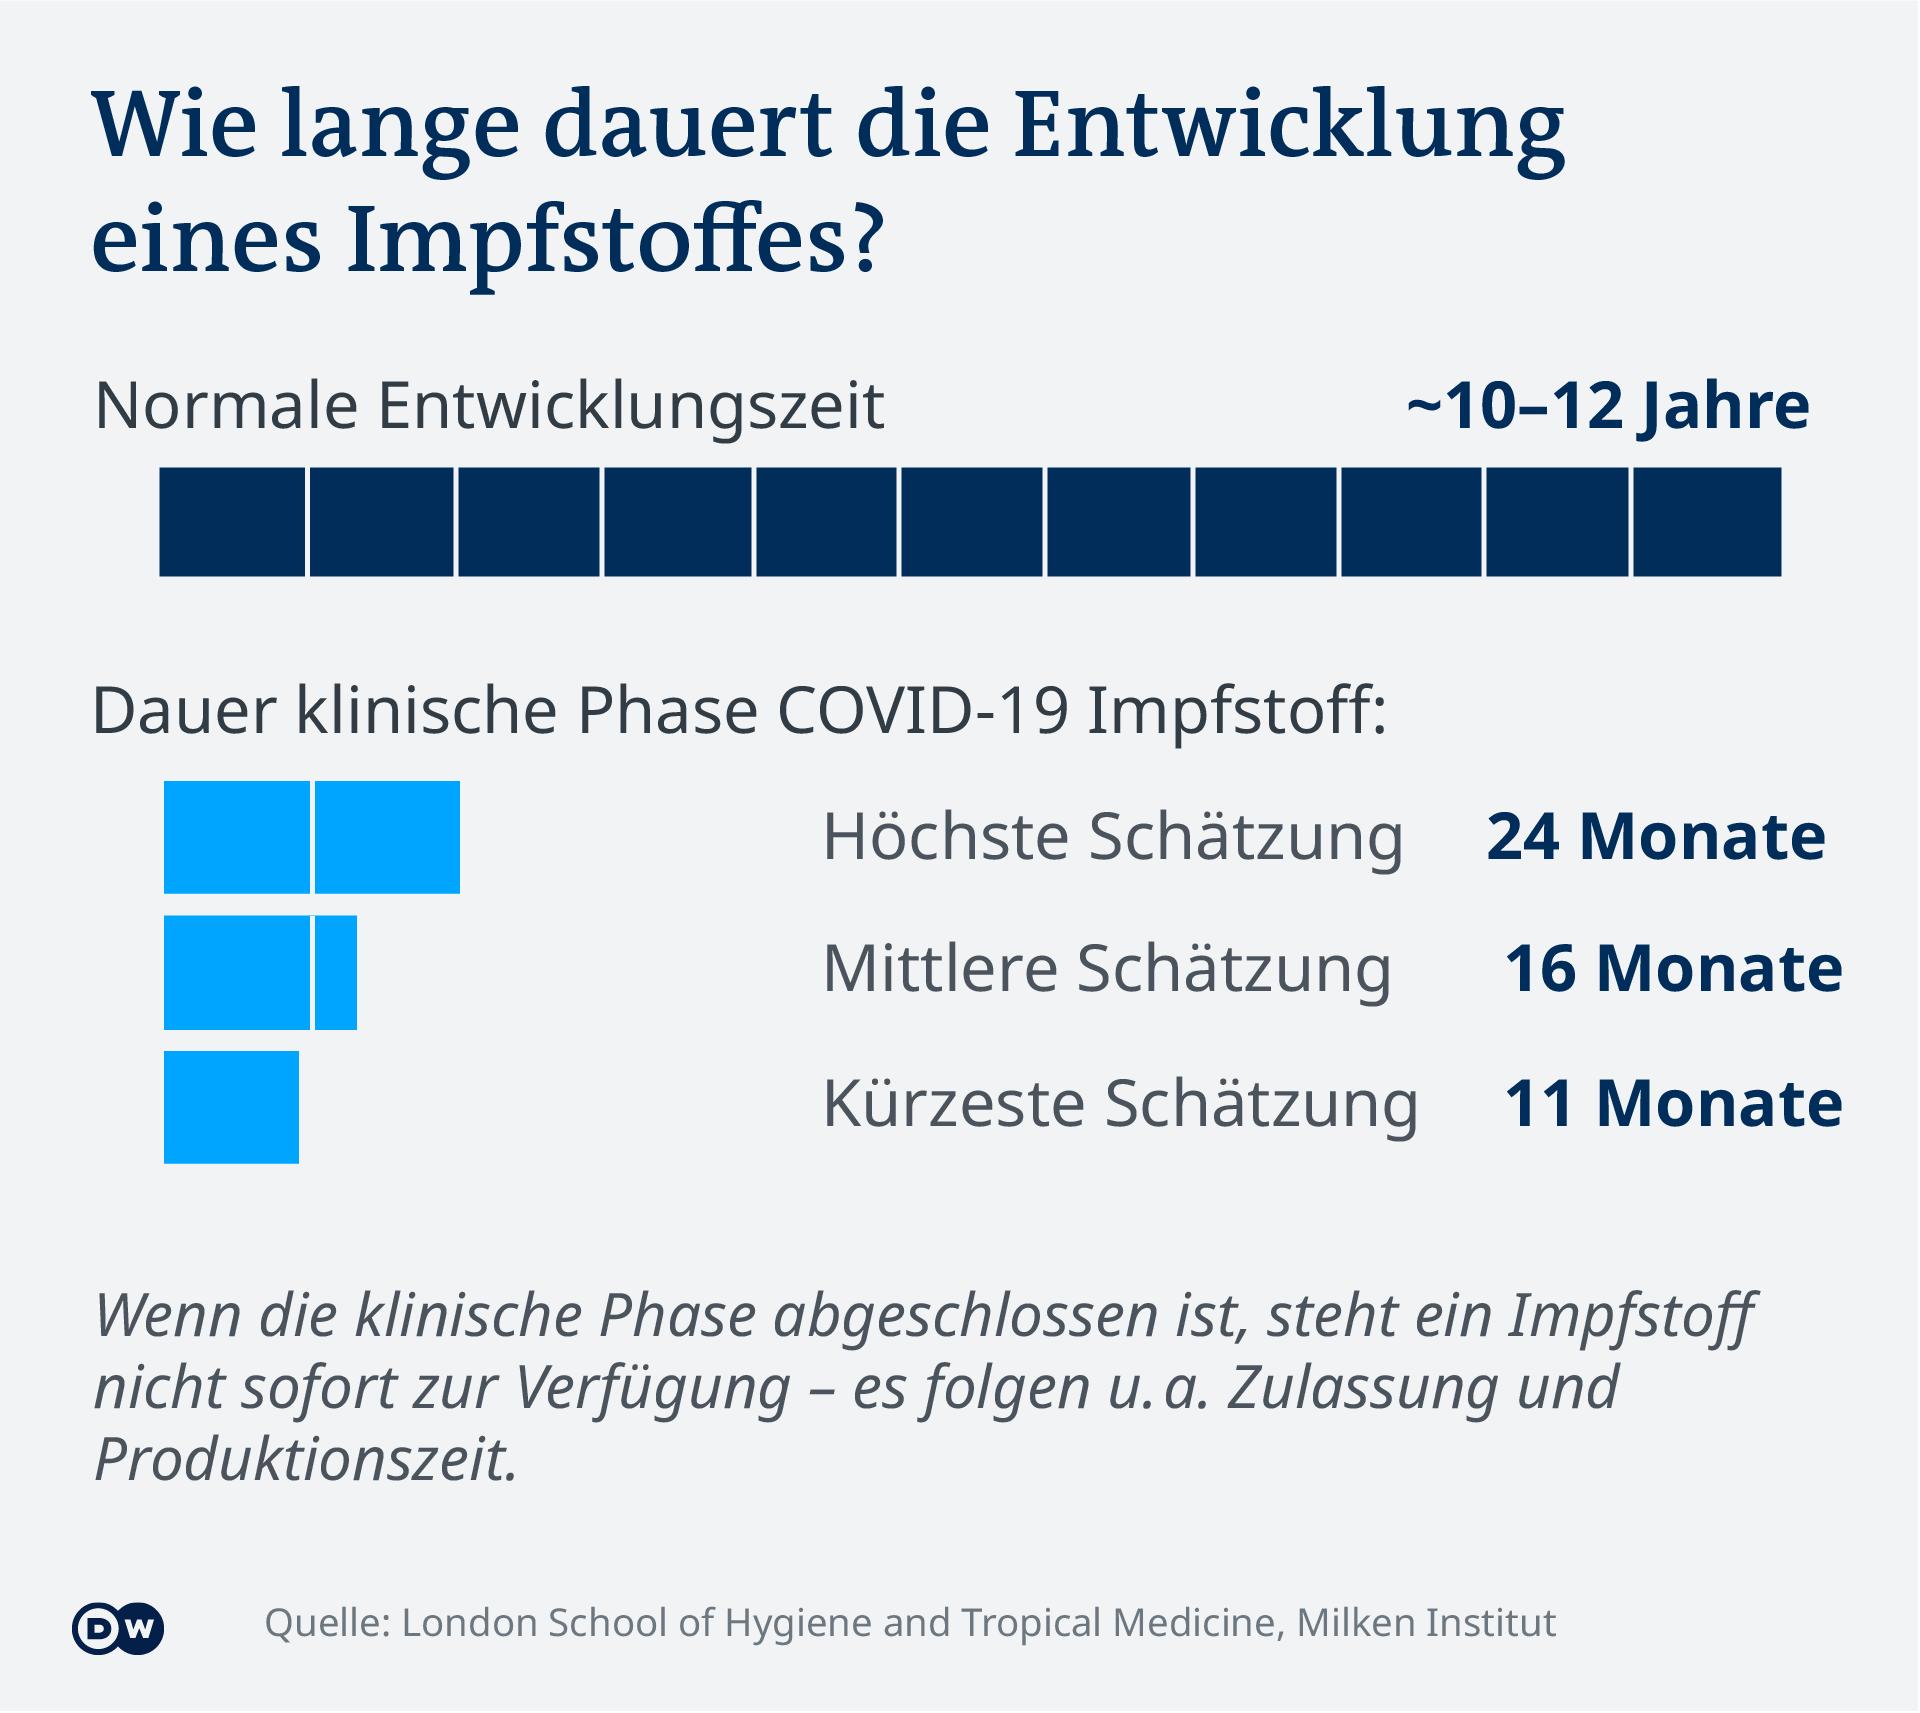 Data visualization - COVID-19 vaccine tracker - Duration - Update Jan 29, 2021 - German